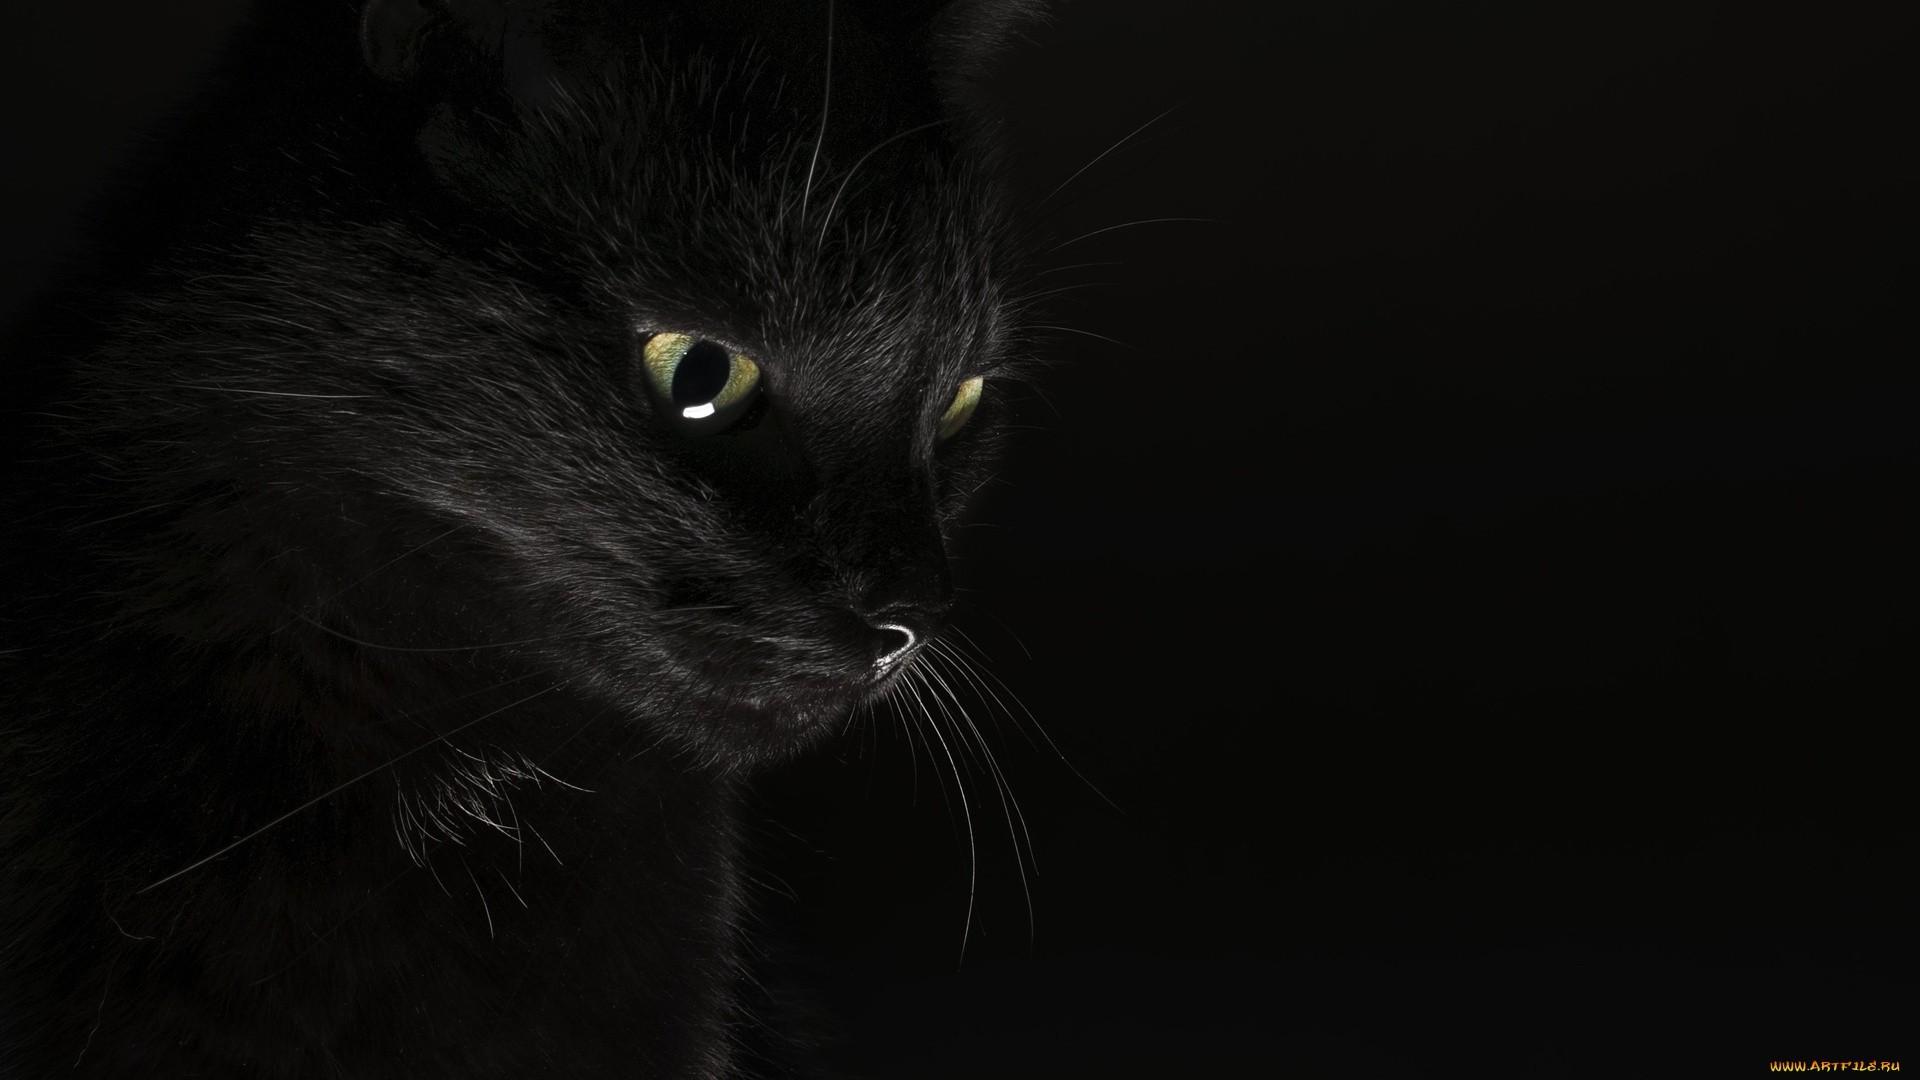 Black Cat Wallpaper theme